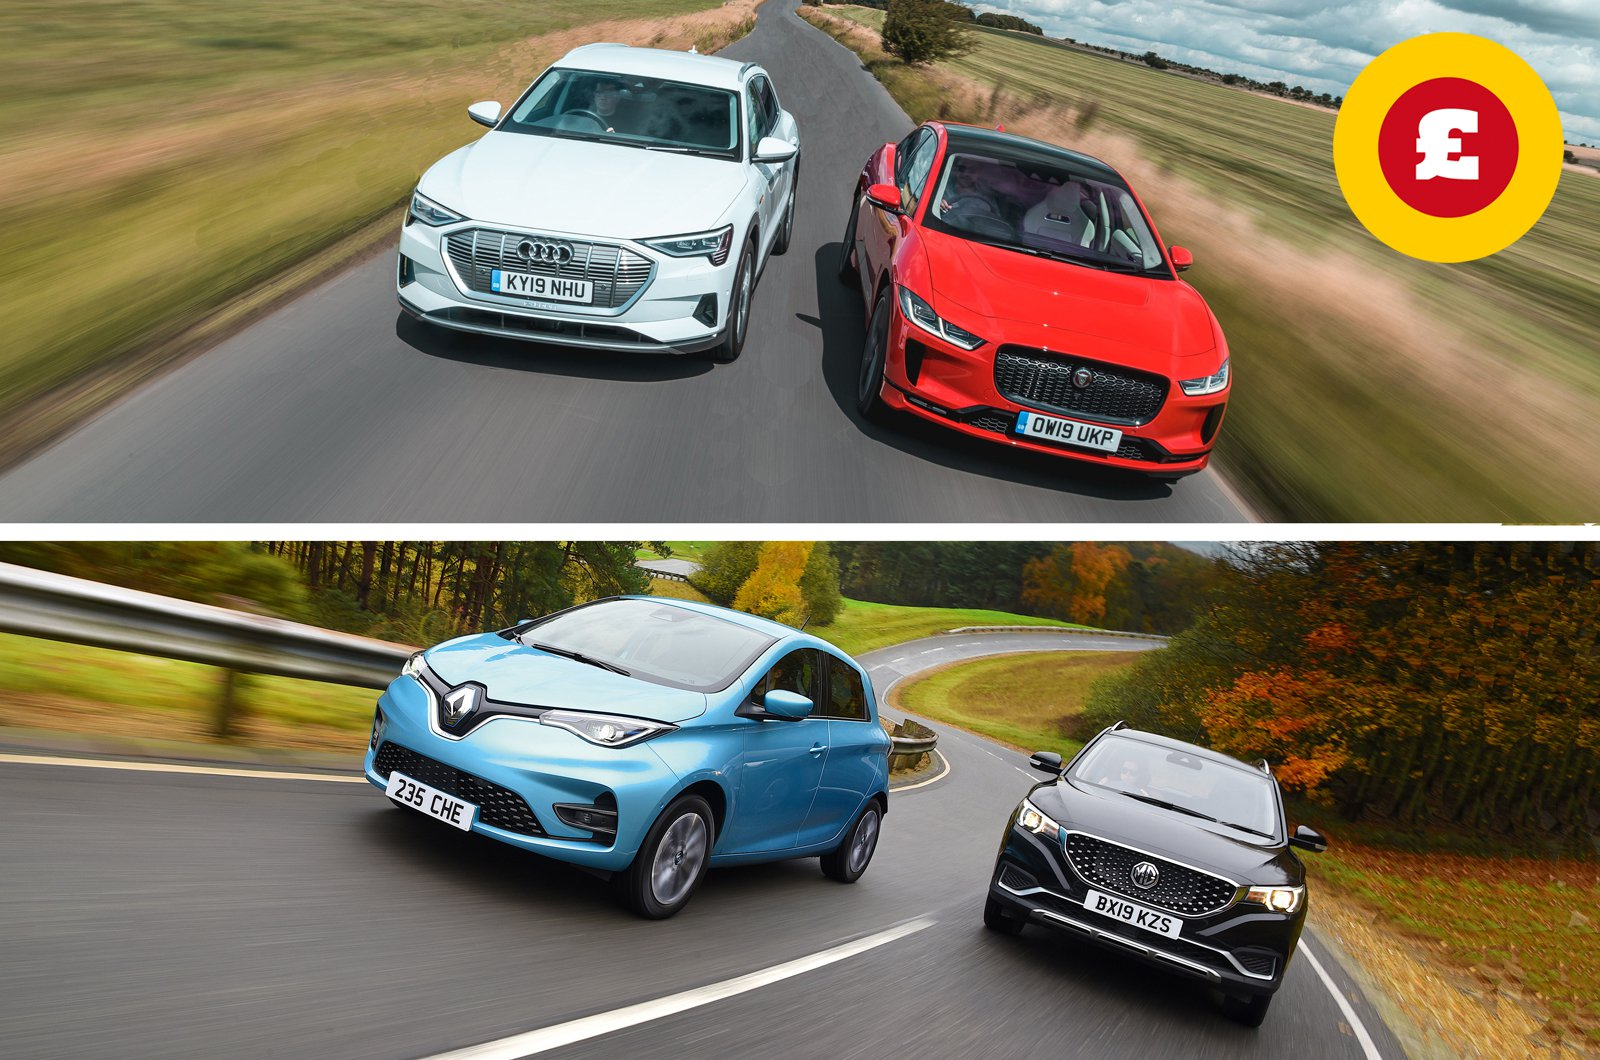 Audi E-tron, Jaguar I-Pace, Renault Zoe and MG SZ EV